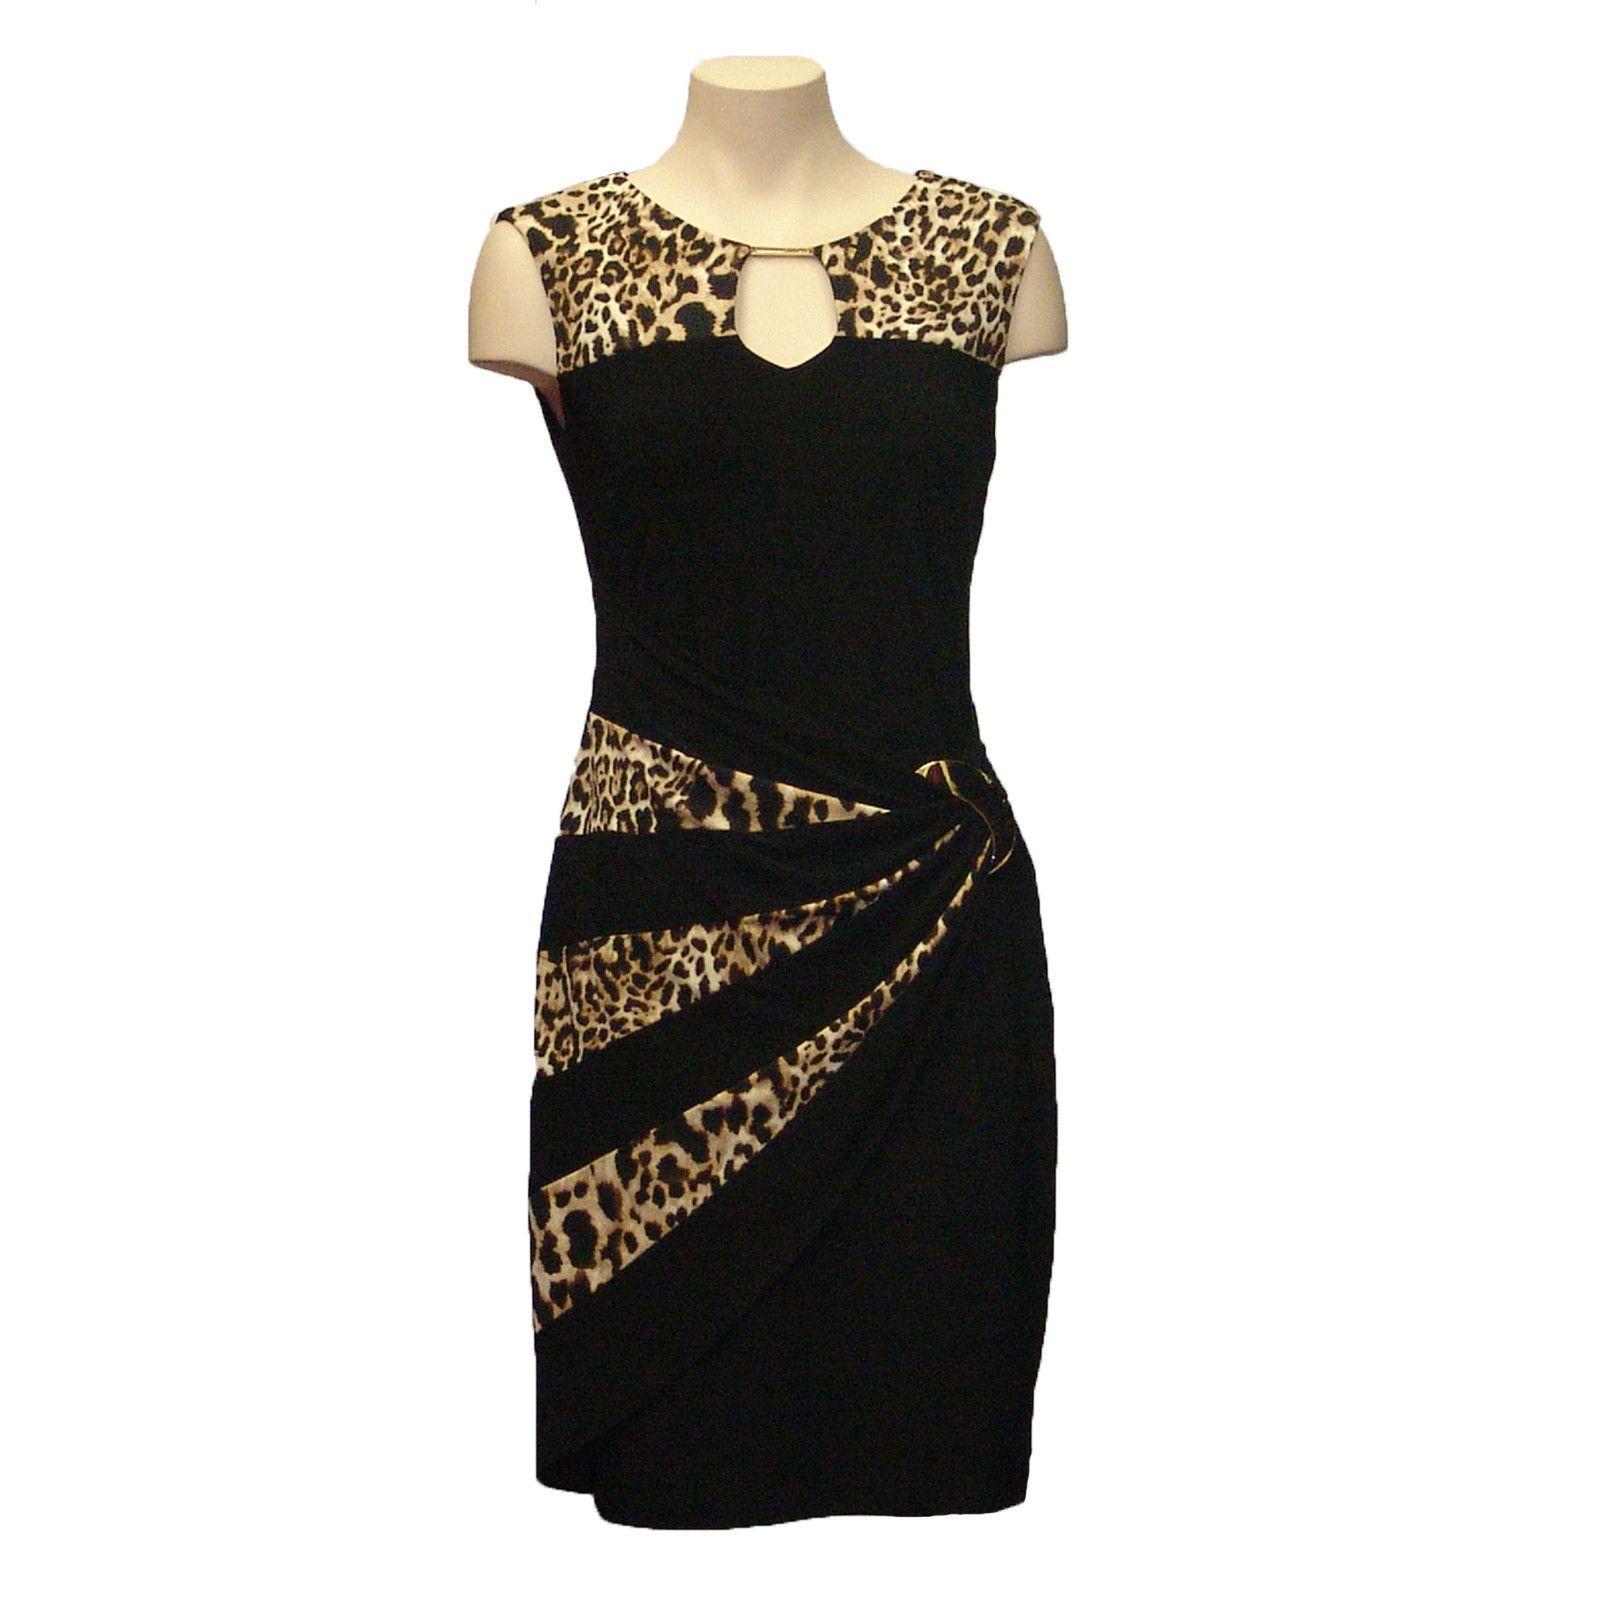 Joseph ribkoff black and brown dress size us gold